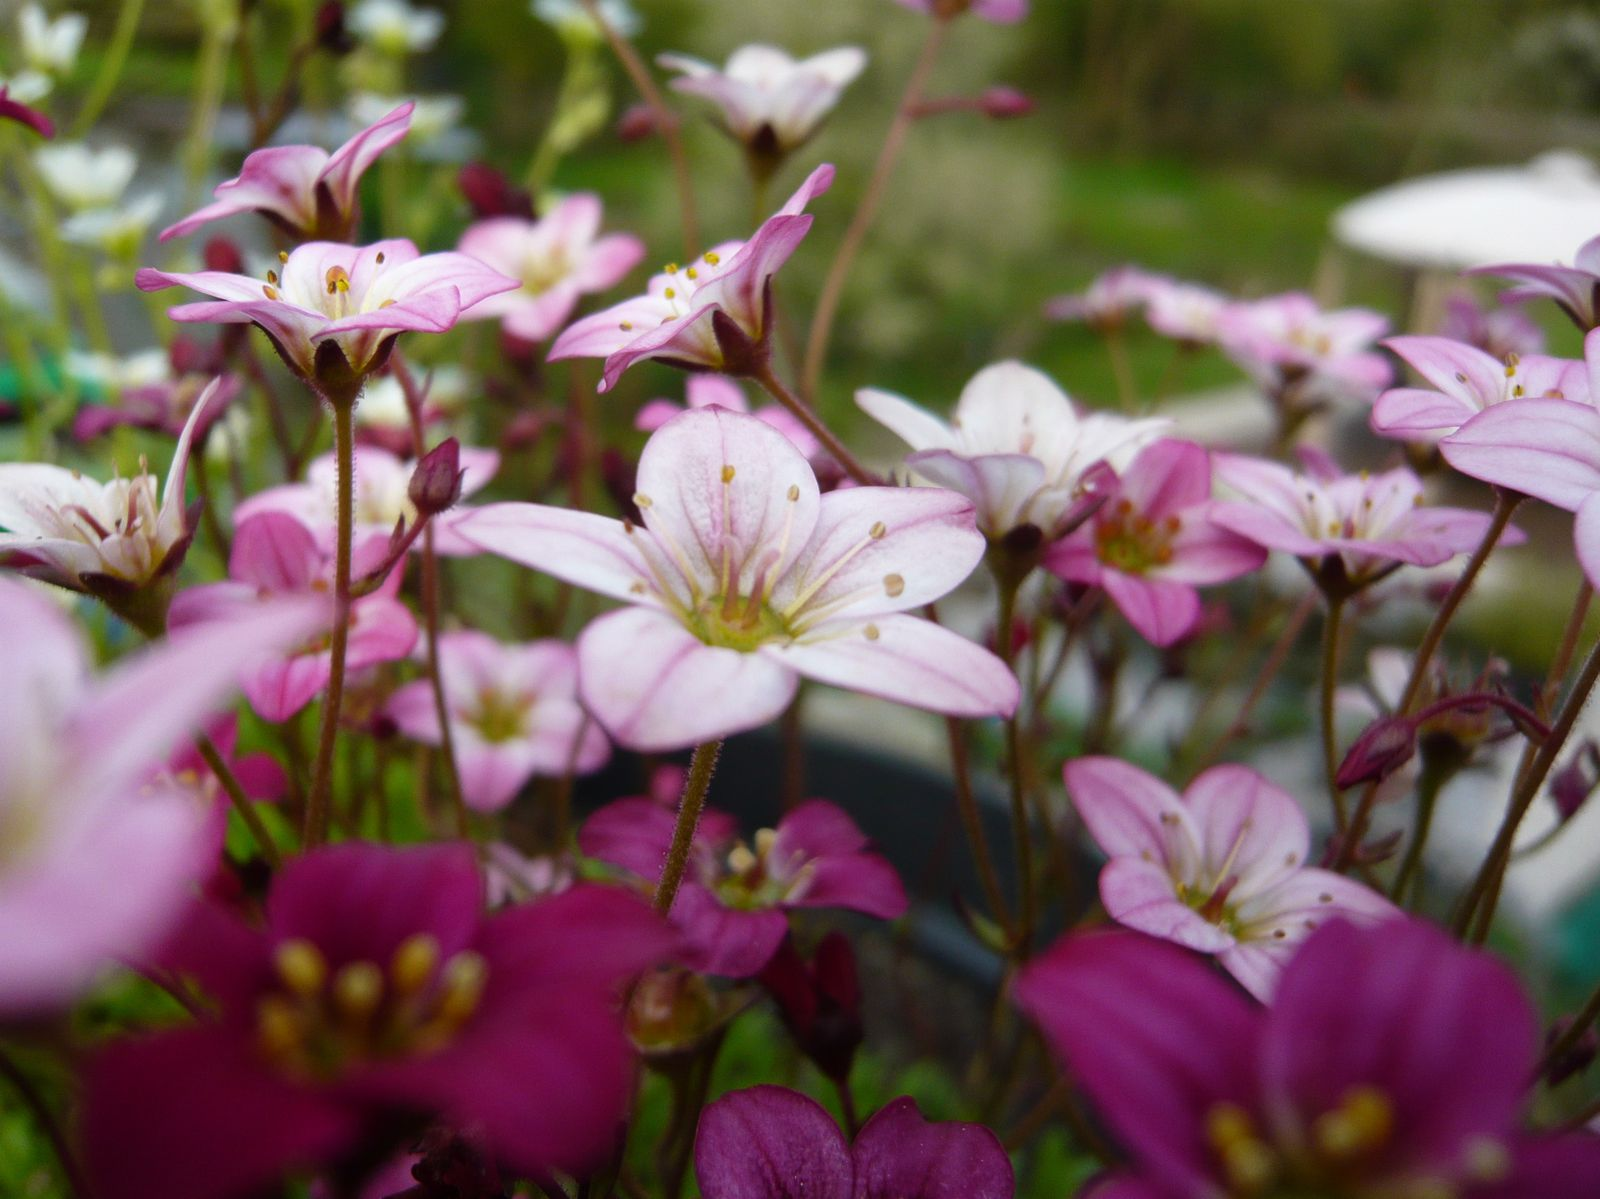 Les saxifrages rose intense, rose tendre et blanc